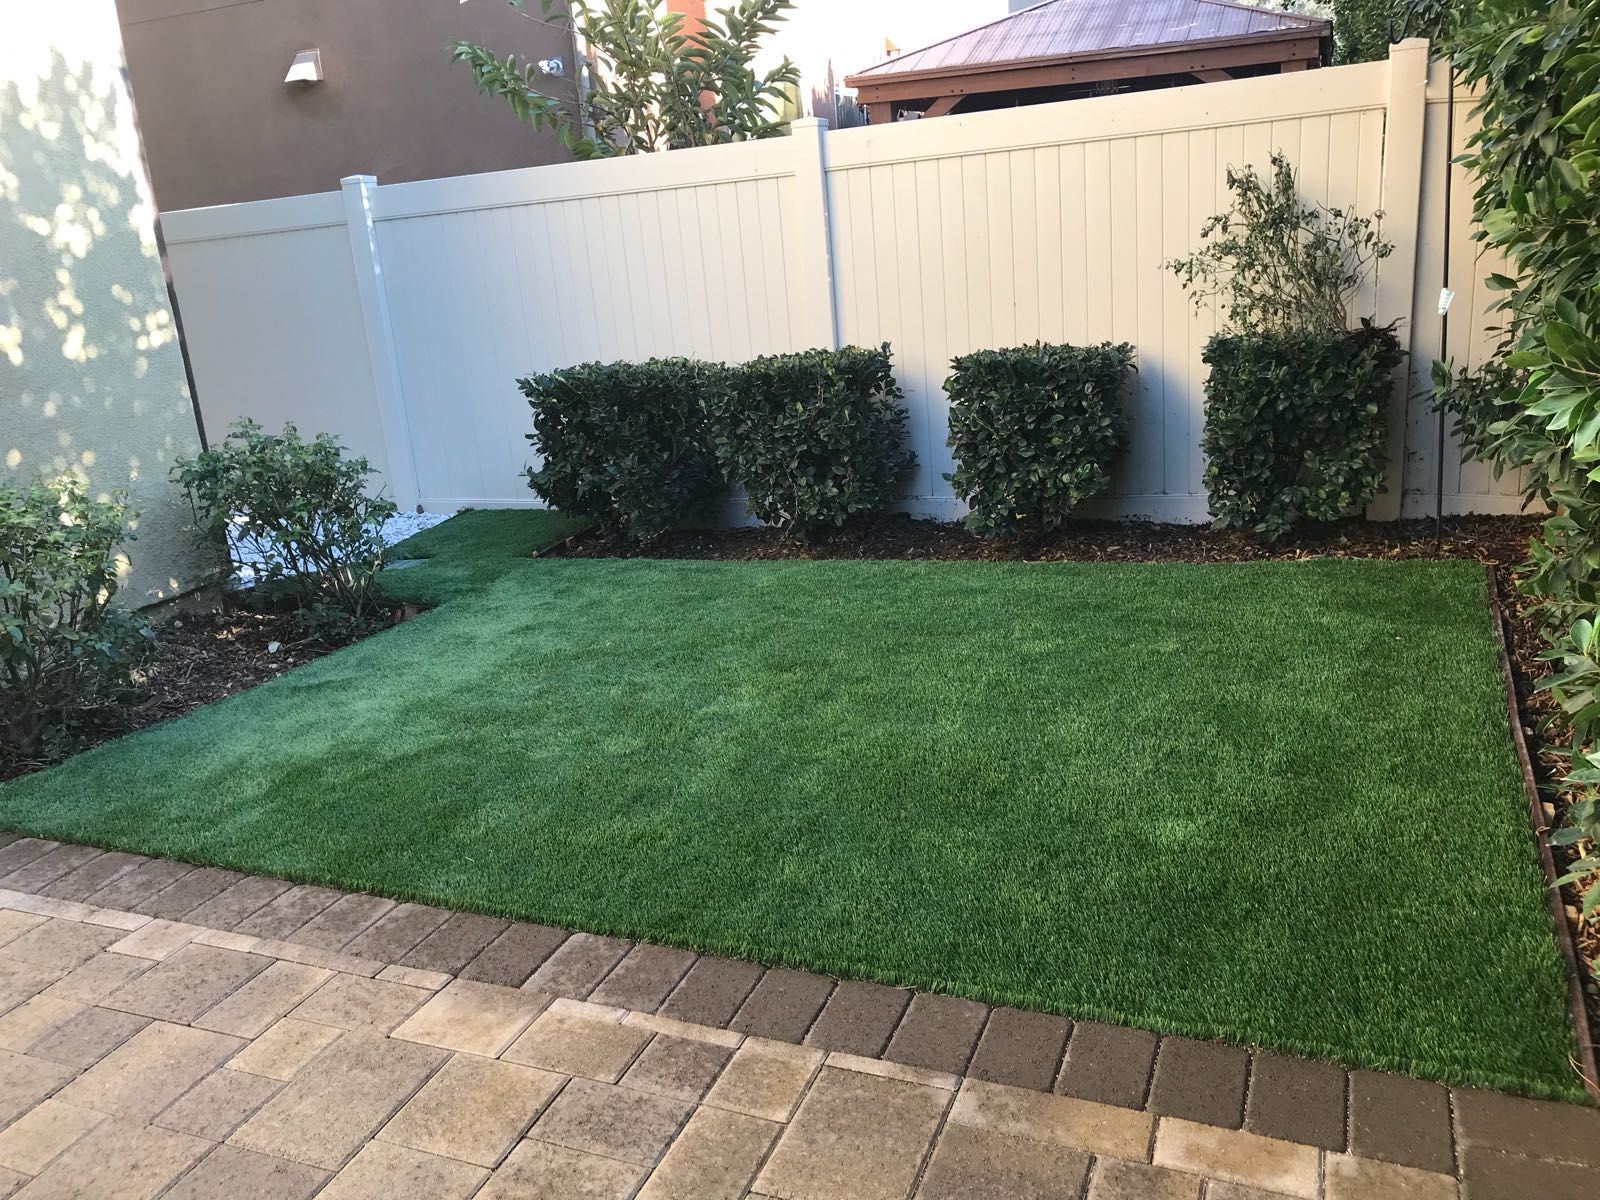 Paver Installation | Backyard renovations, Energy ... on Backyard Renovations Cost id=74880